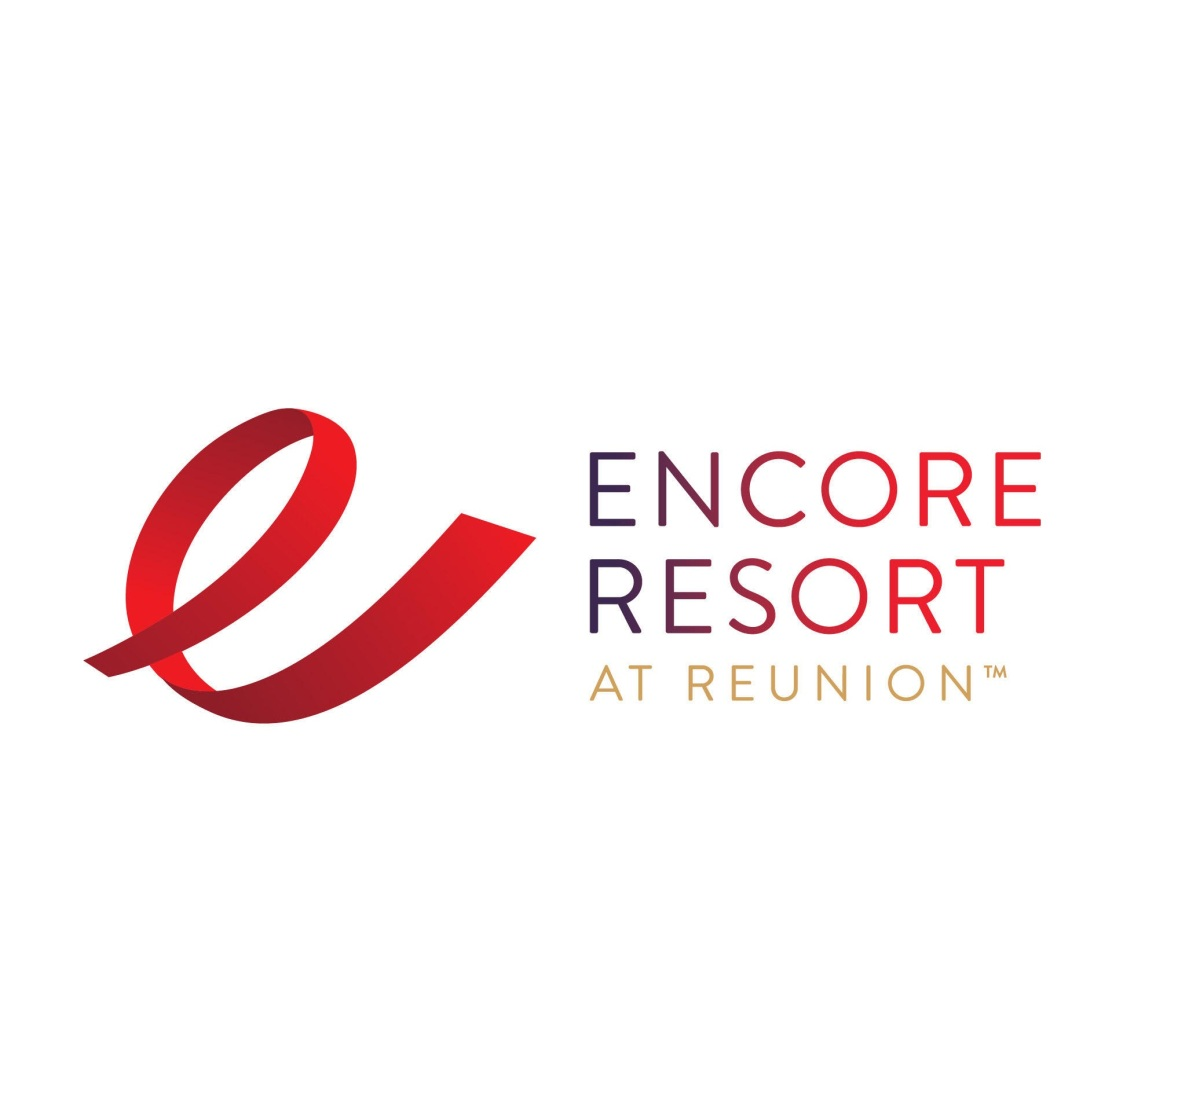 Orlando's Encore Resort At Reunion Celebrates National